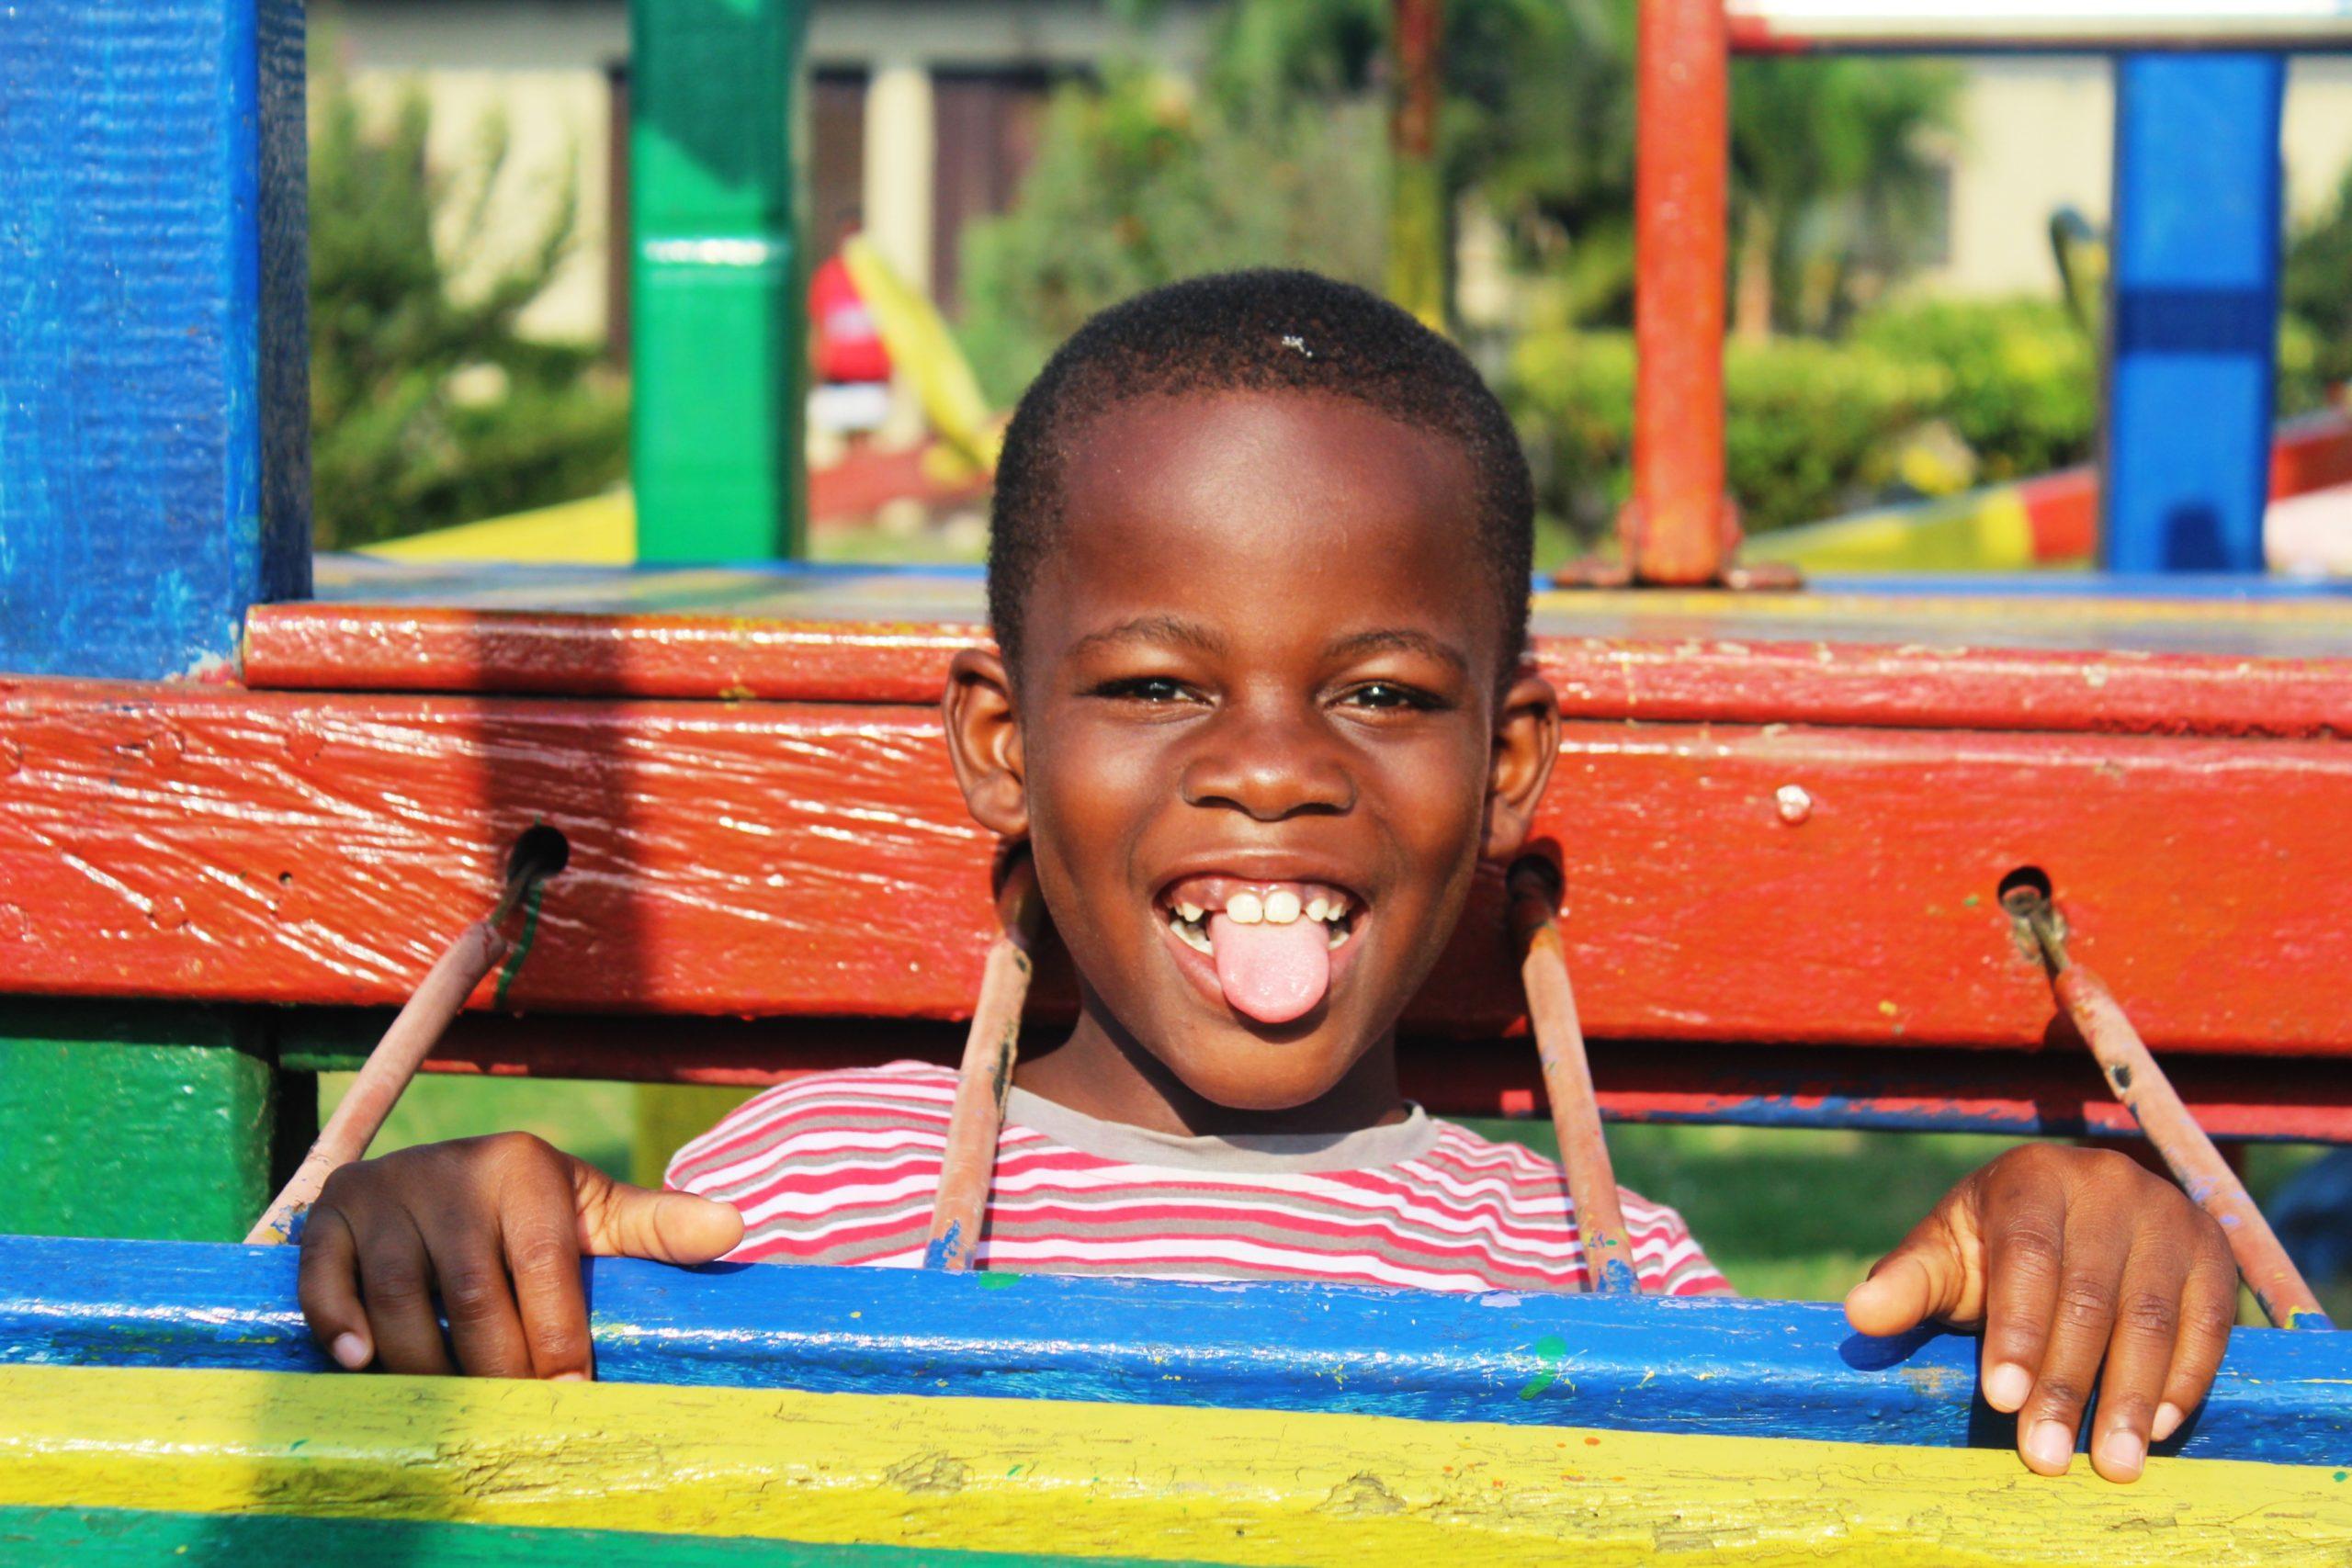 Schulkinder Afrika Kinder Paradise